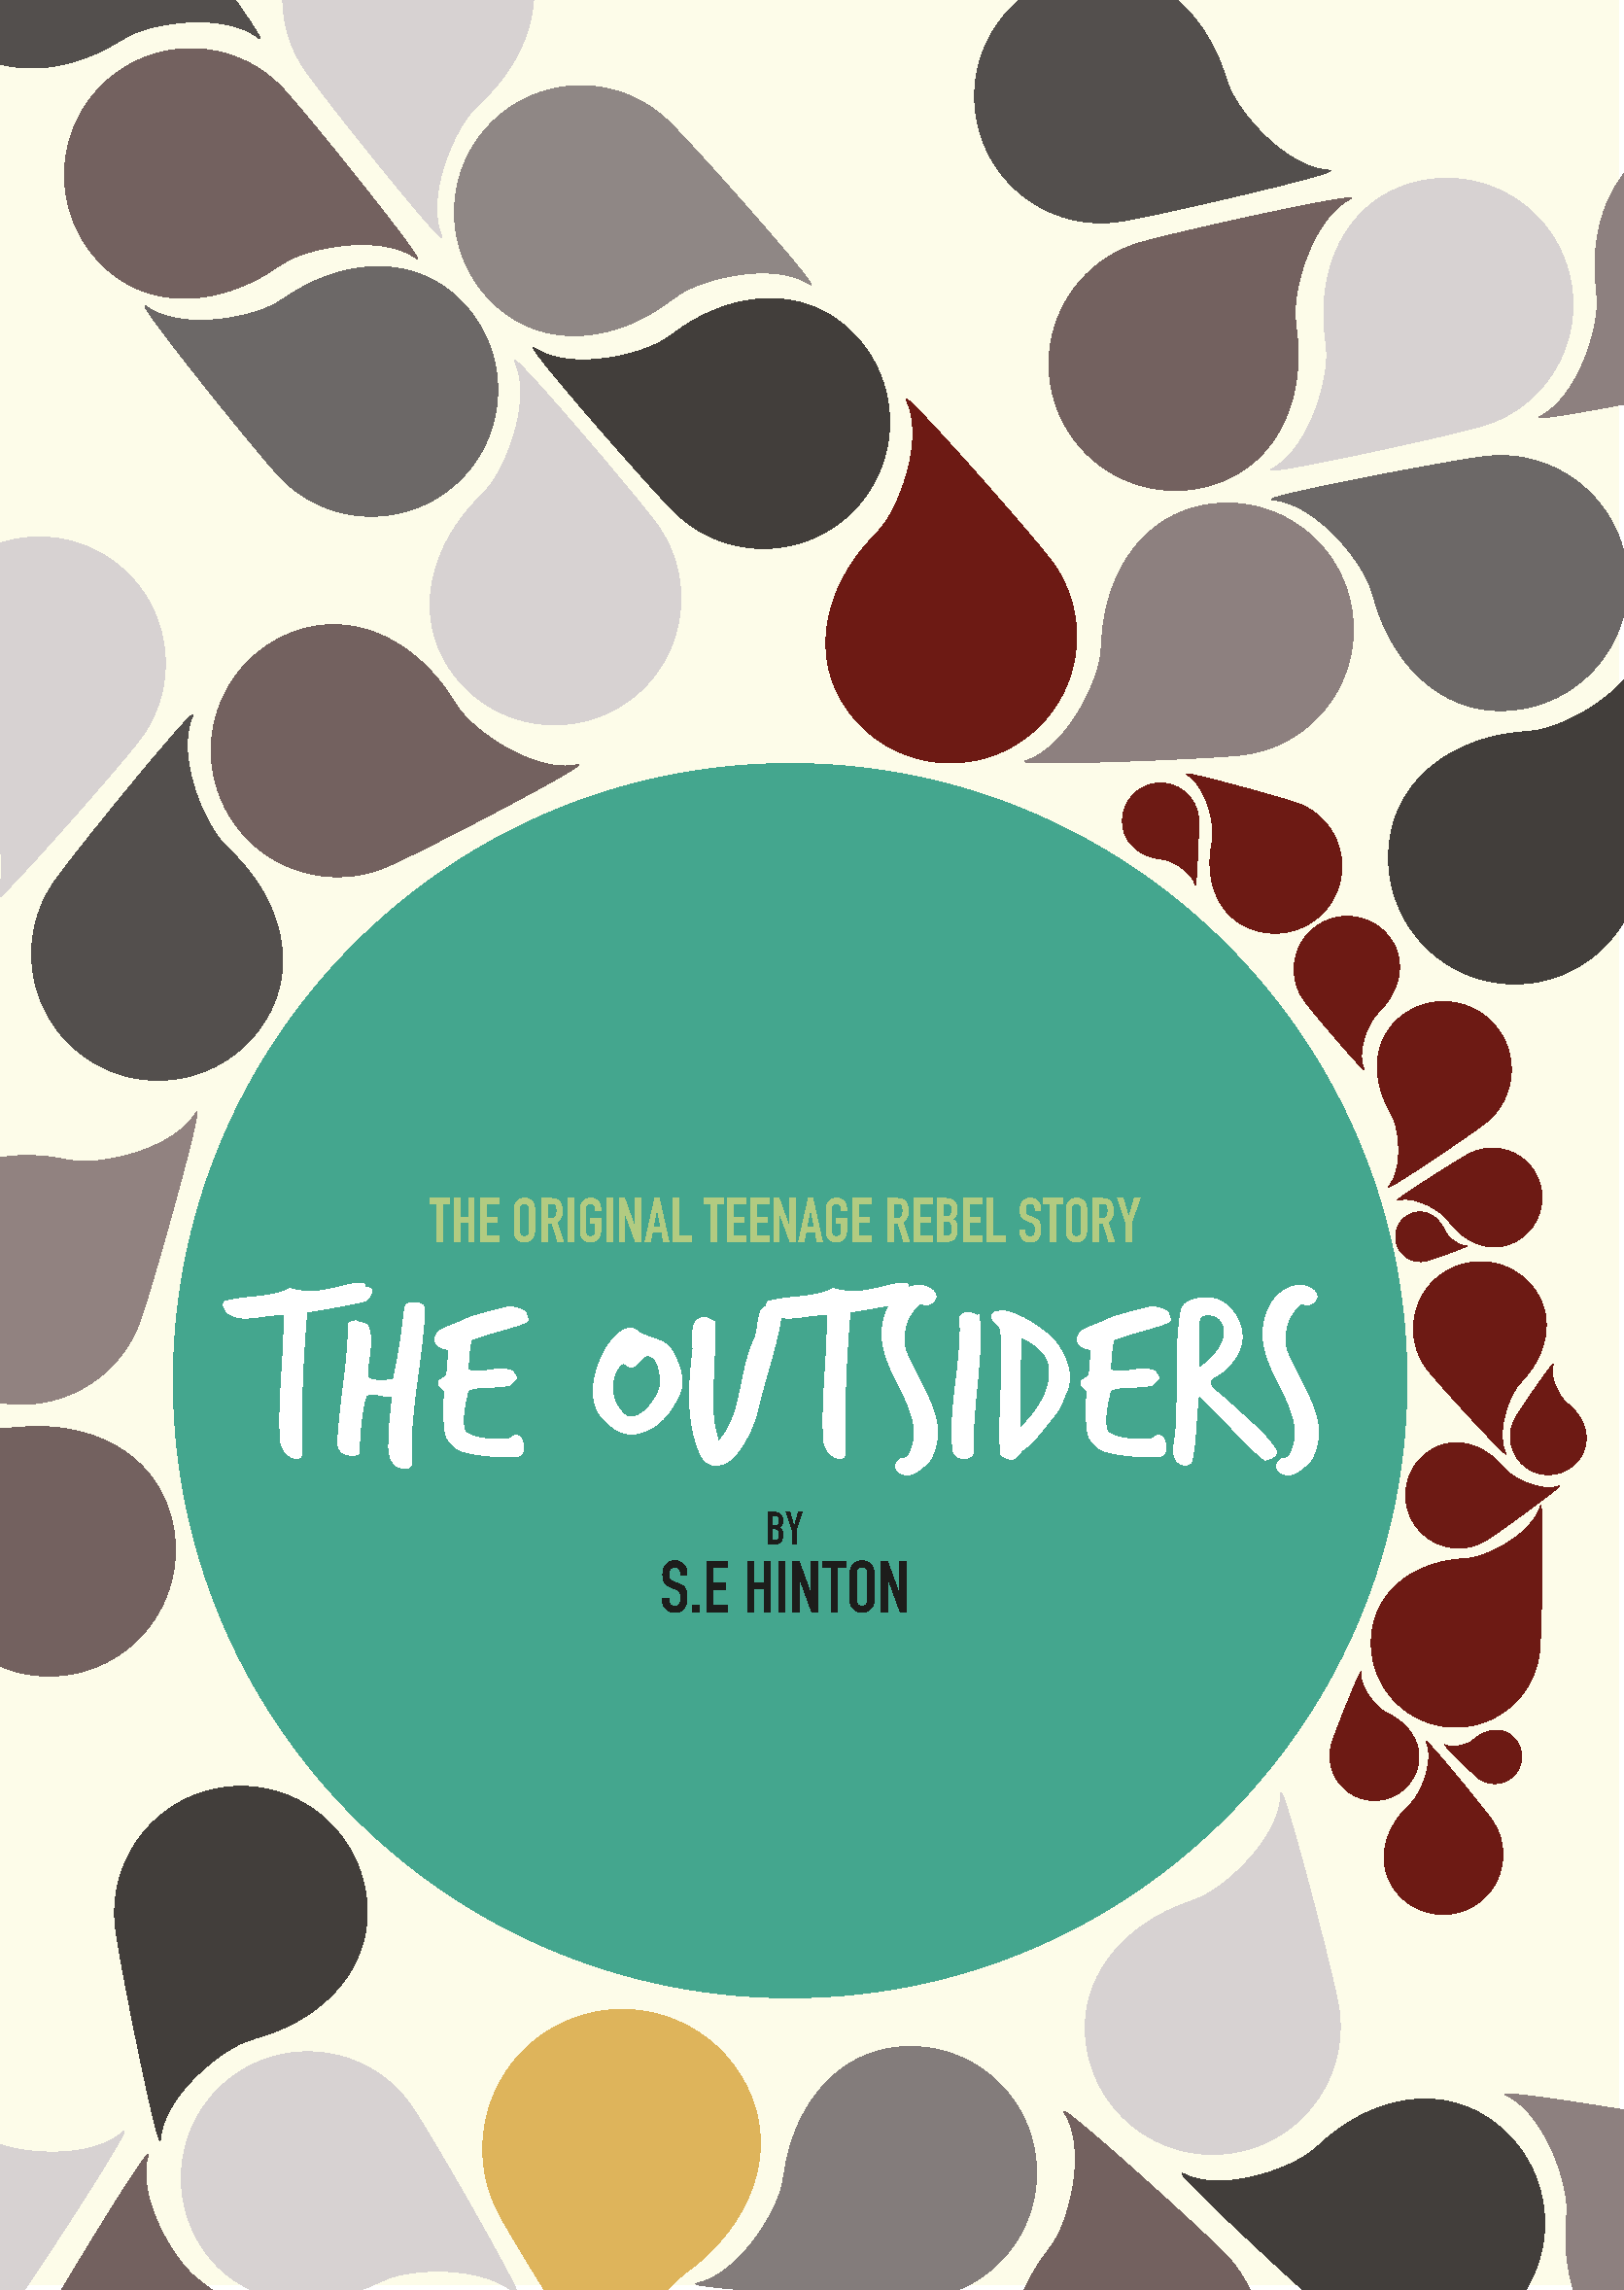 Book cover I